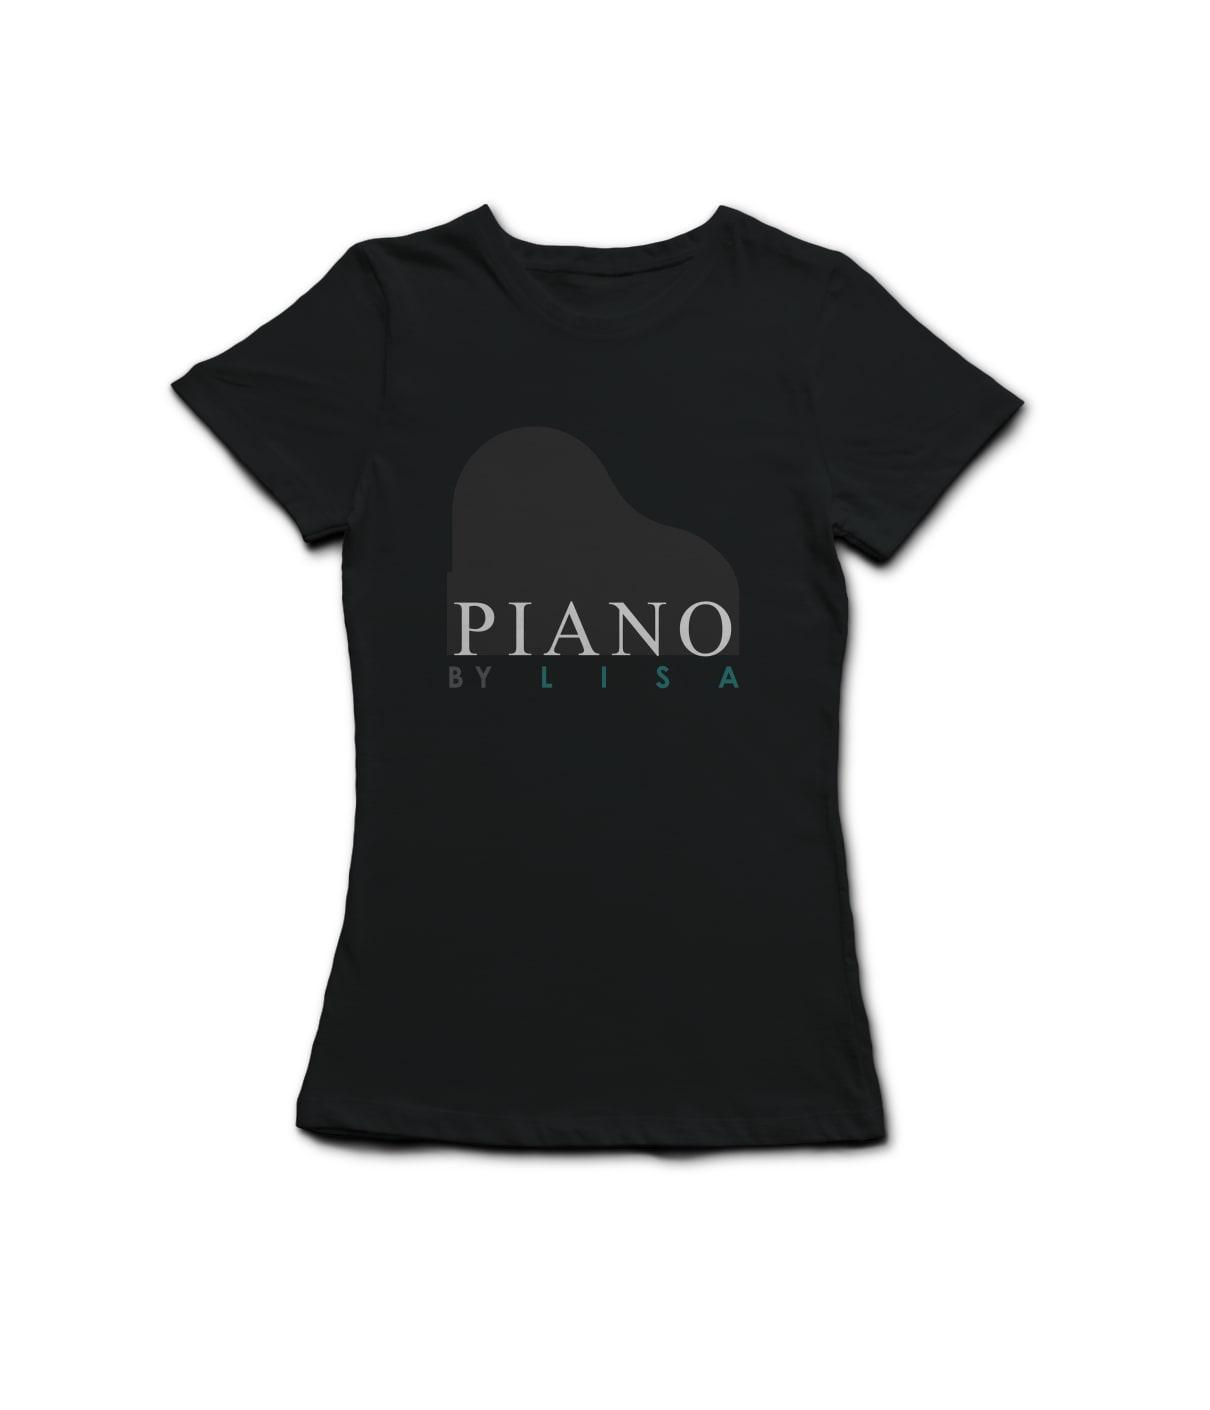 L t shirt black osaunc